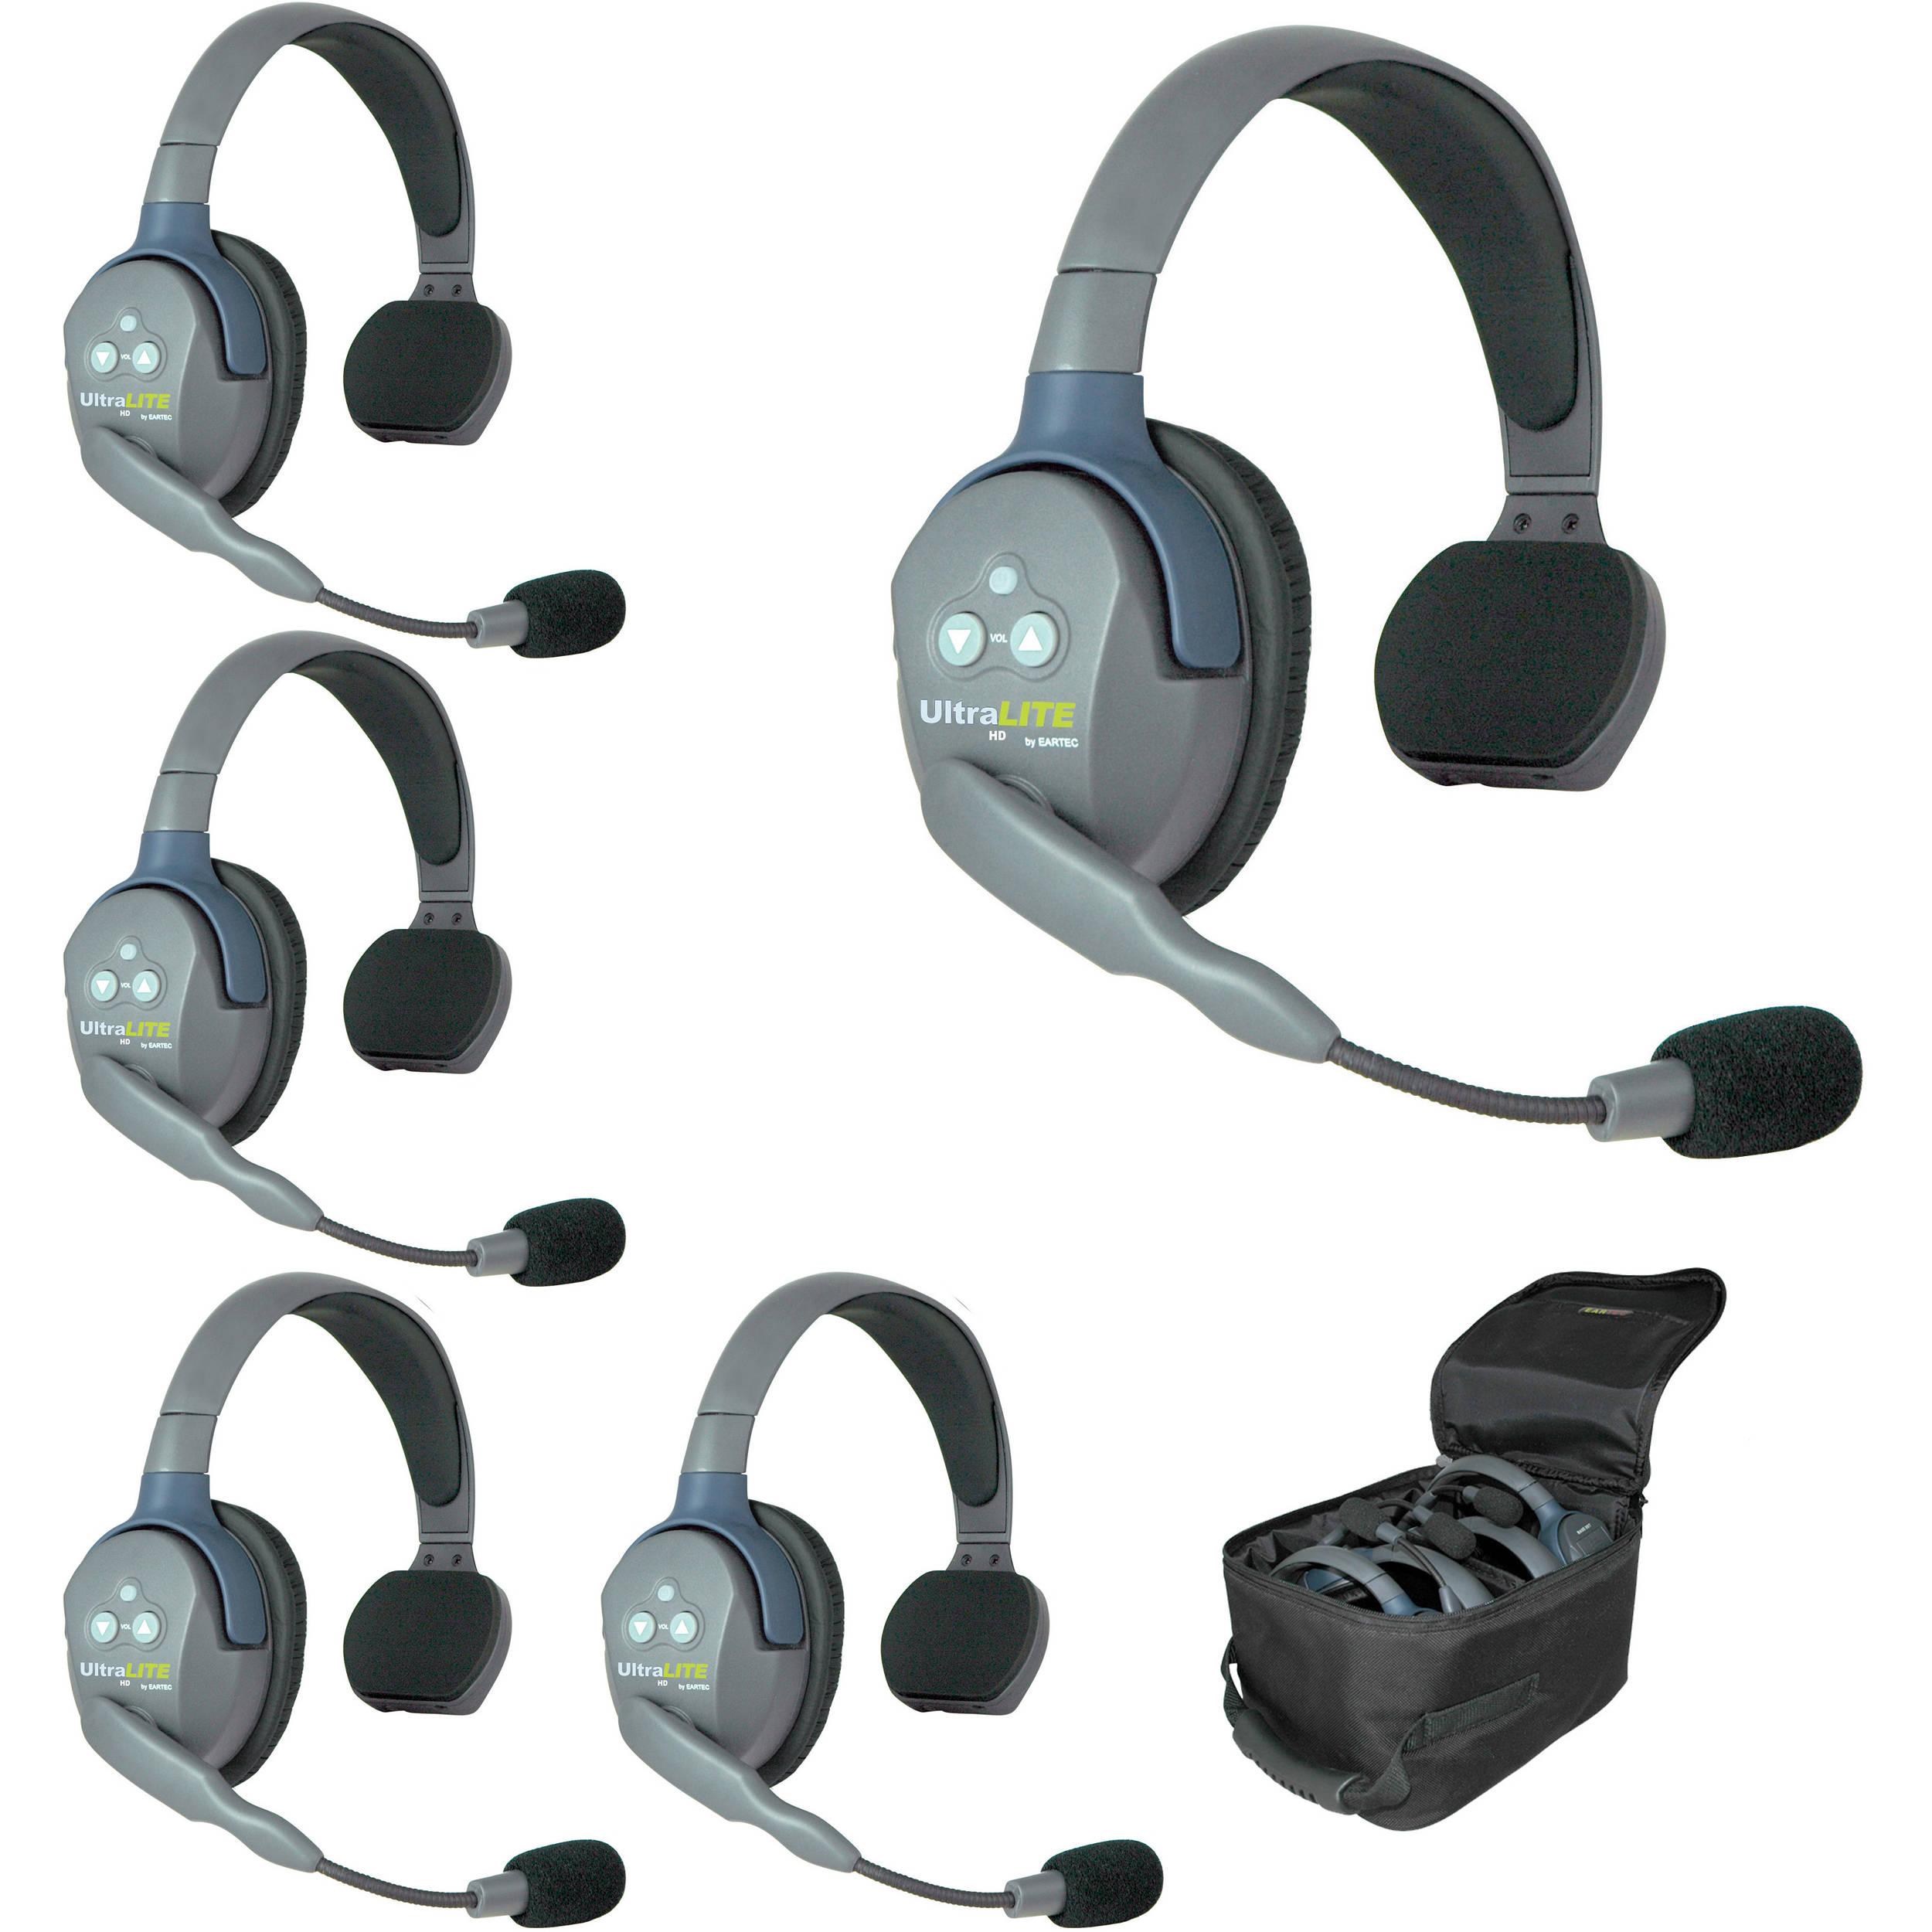 Eartec Ul5s 5 Person Full Duplex Wireless Intercom With 5 Ul5s